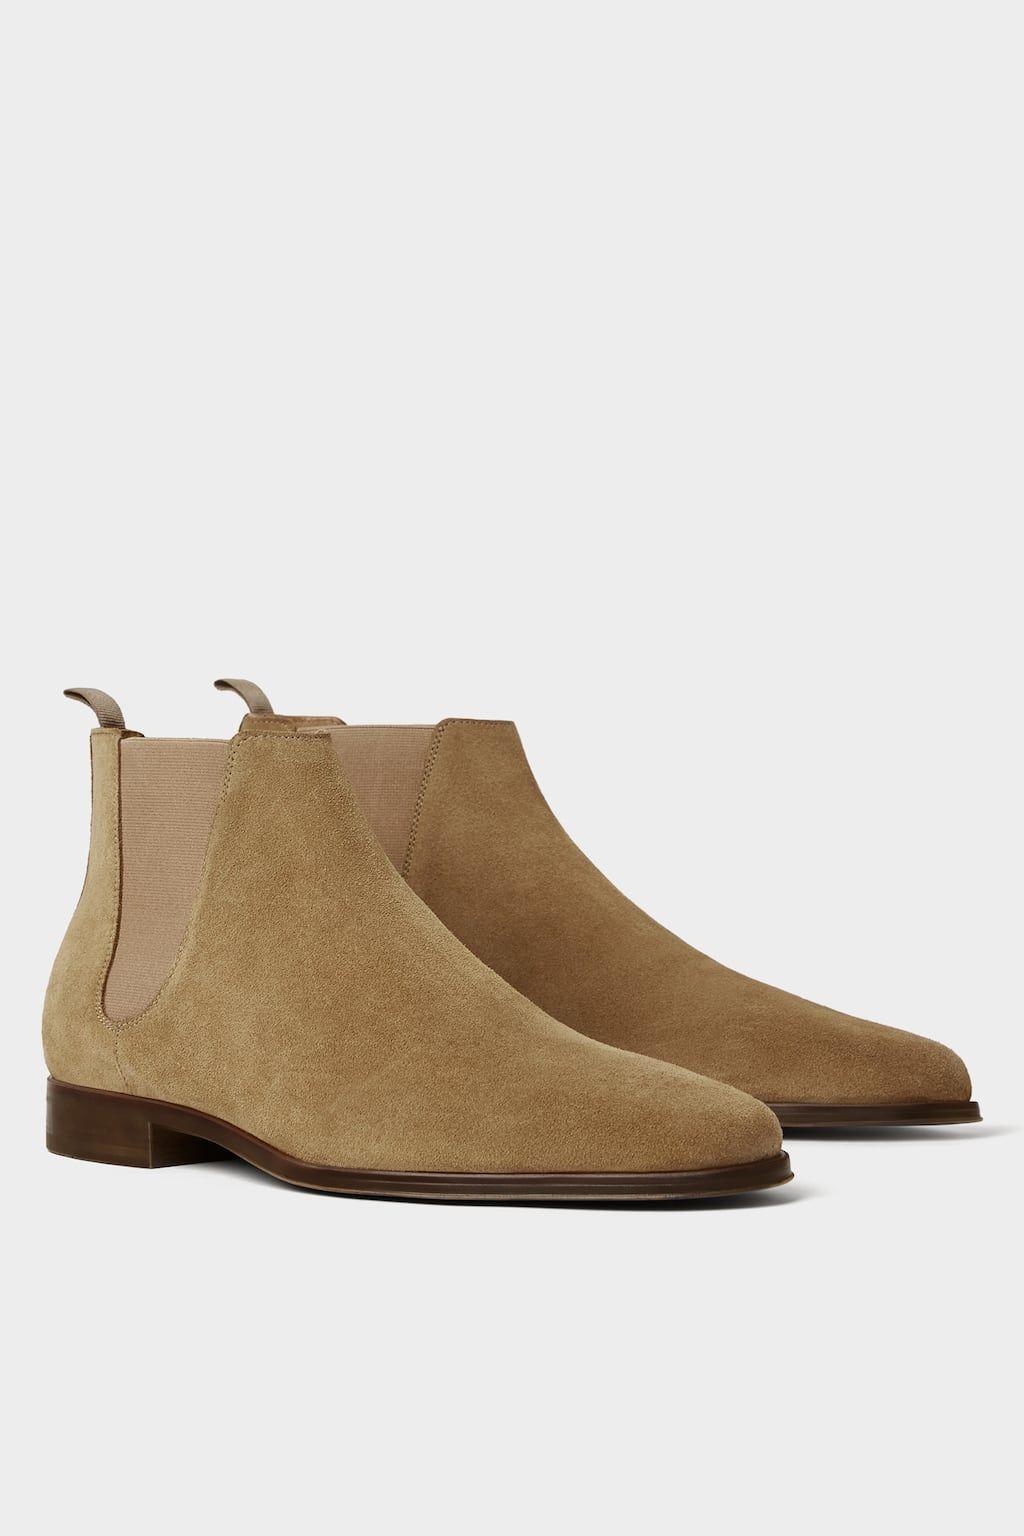 Beige Sport Leather Ankle Boot View All Shoes Man Zara United States Sapogi Muzhskie Botinki Kozhanye Botilony